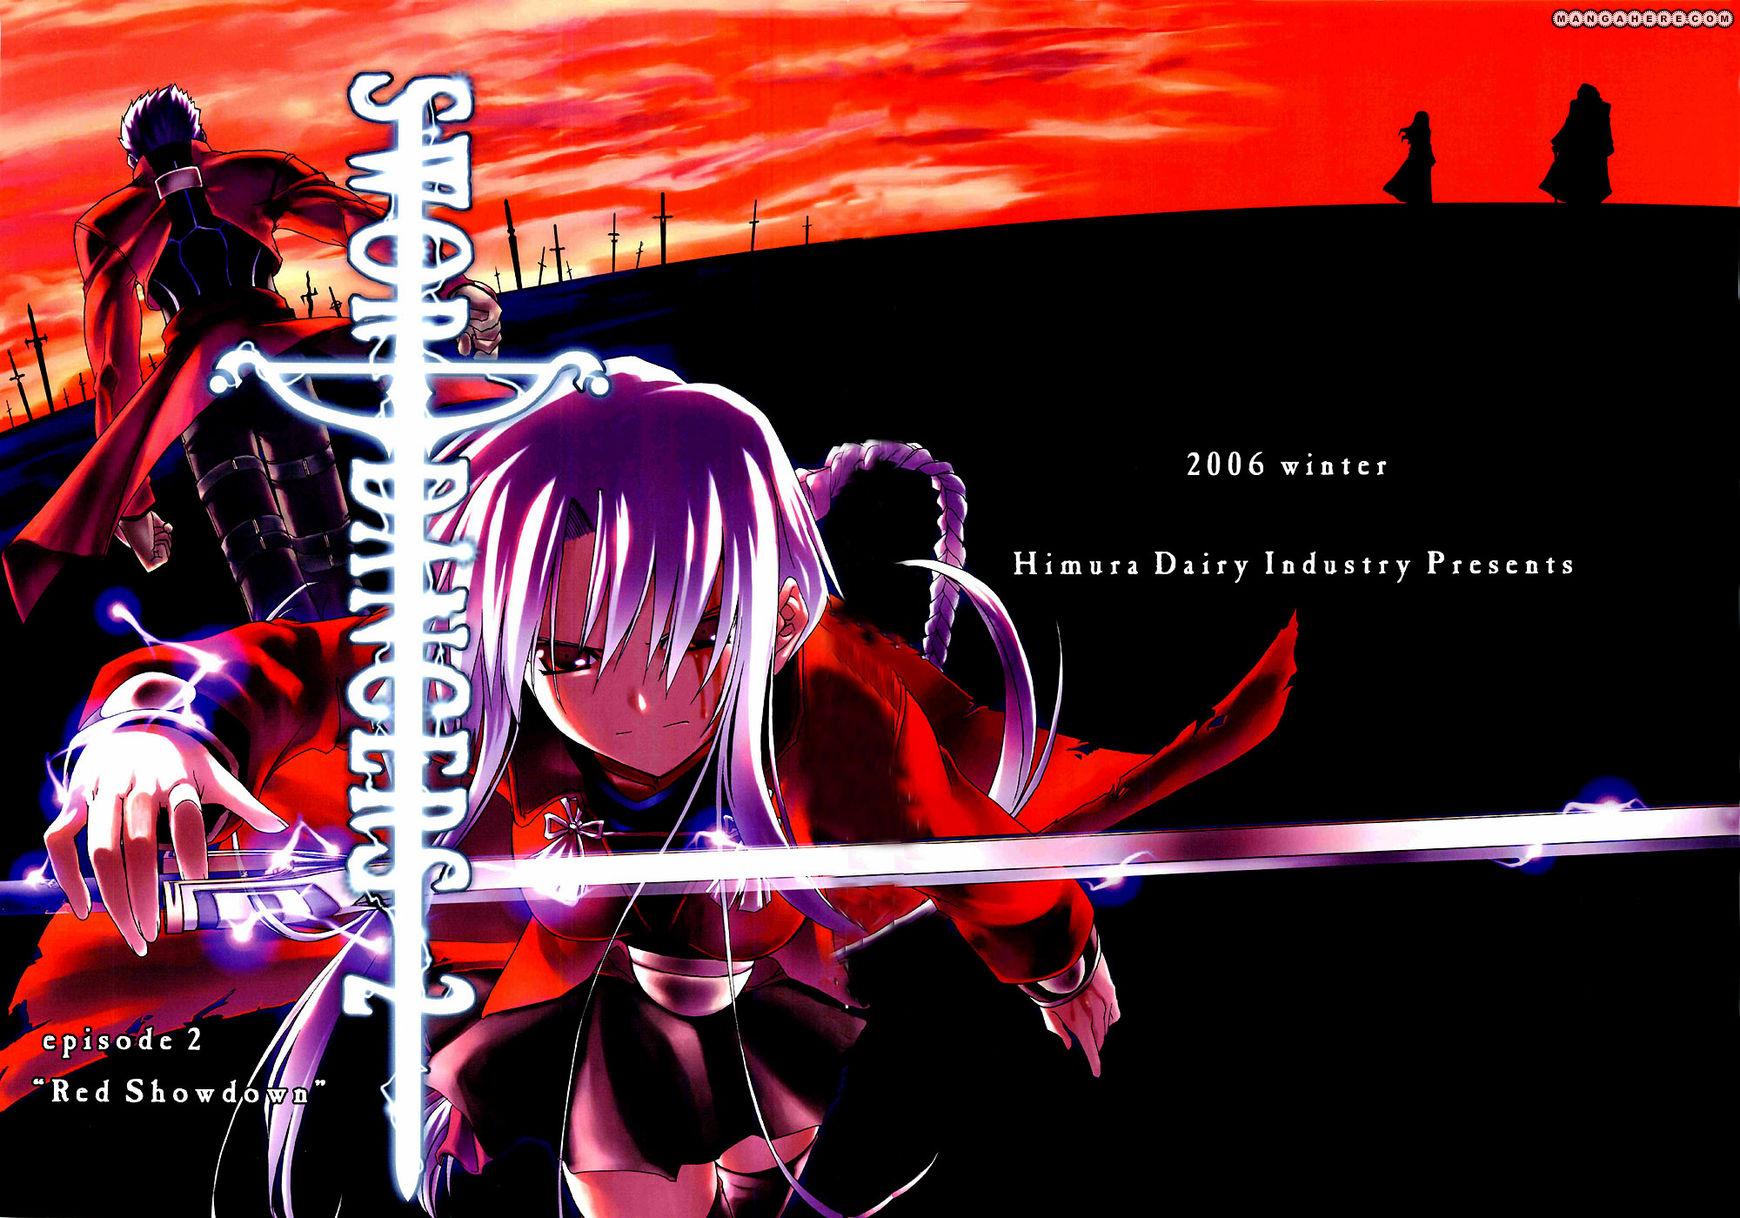 Fate/Stay Night dj - Sword Dancers 2.2 Page 1